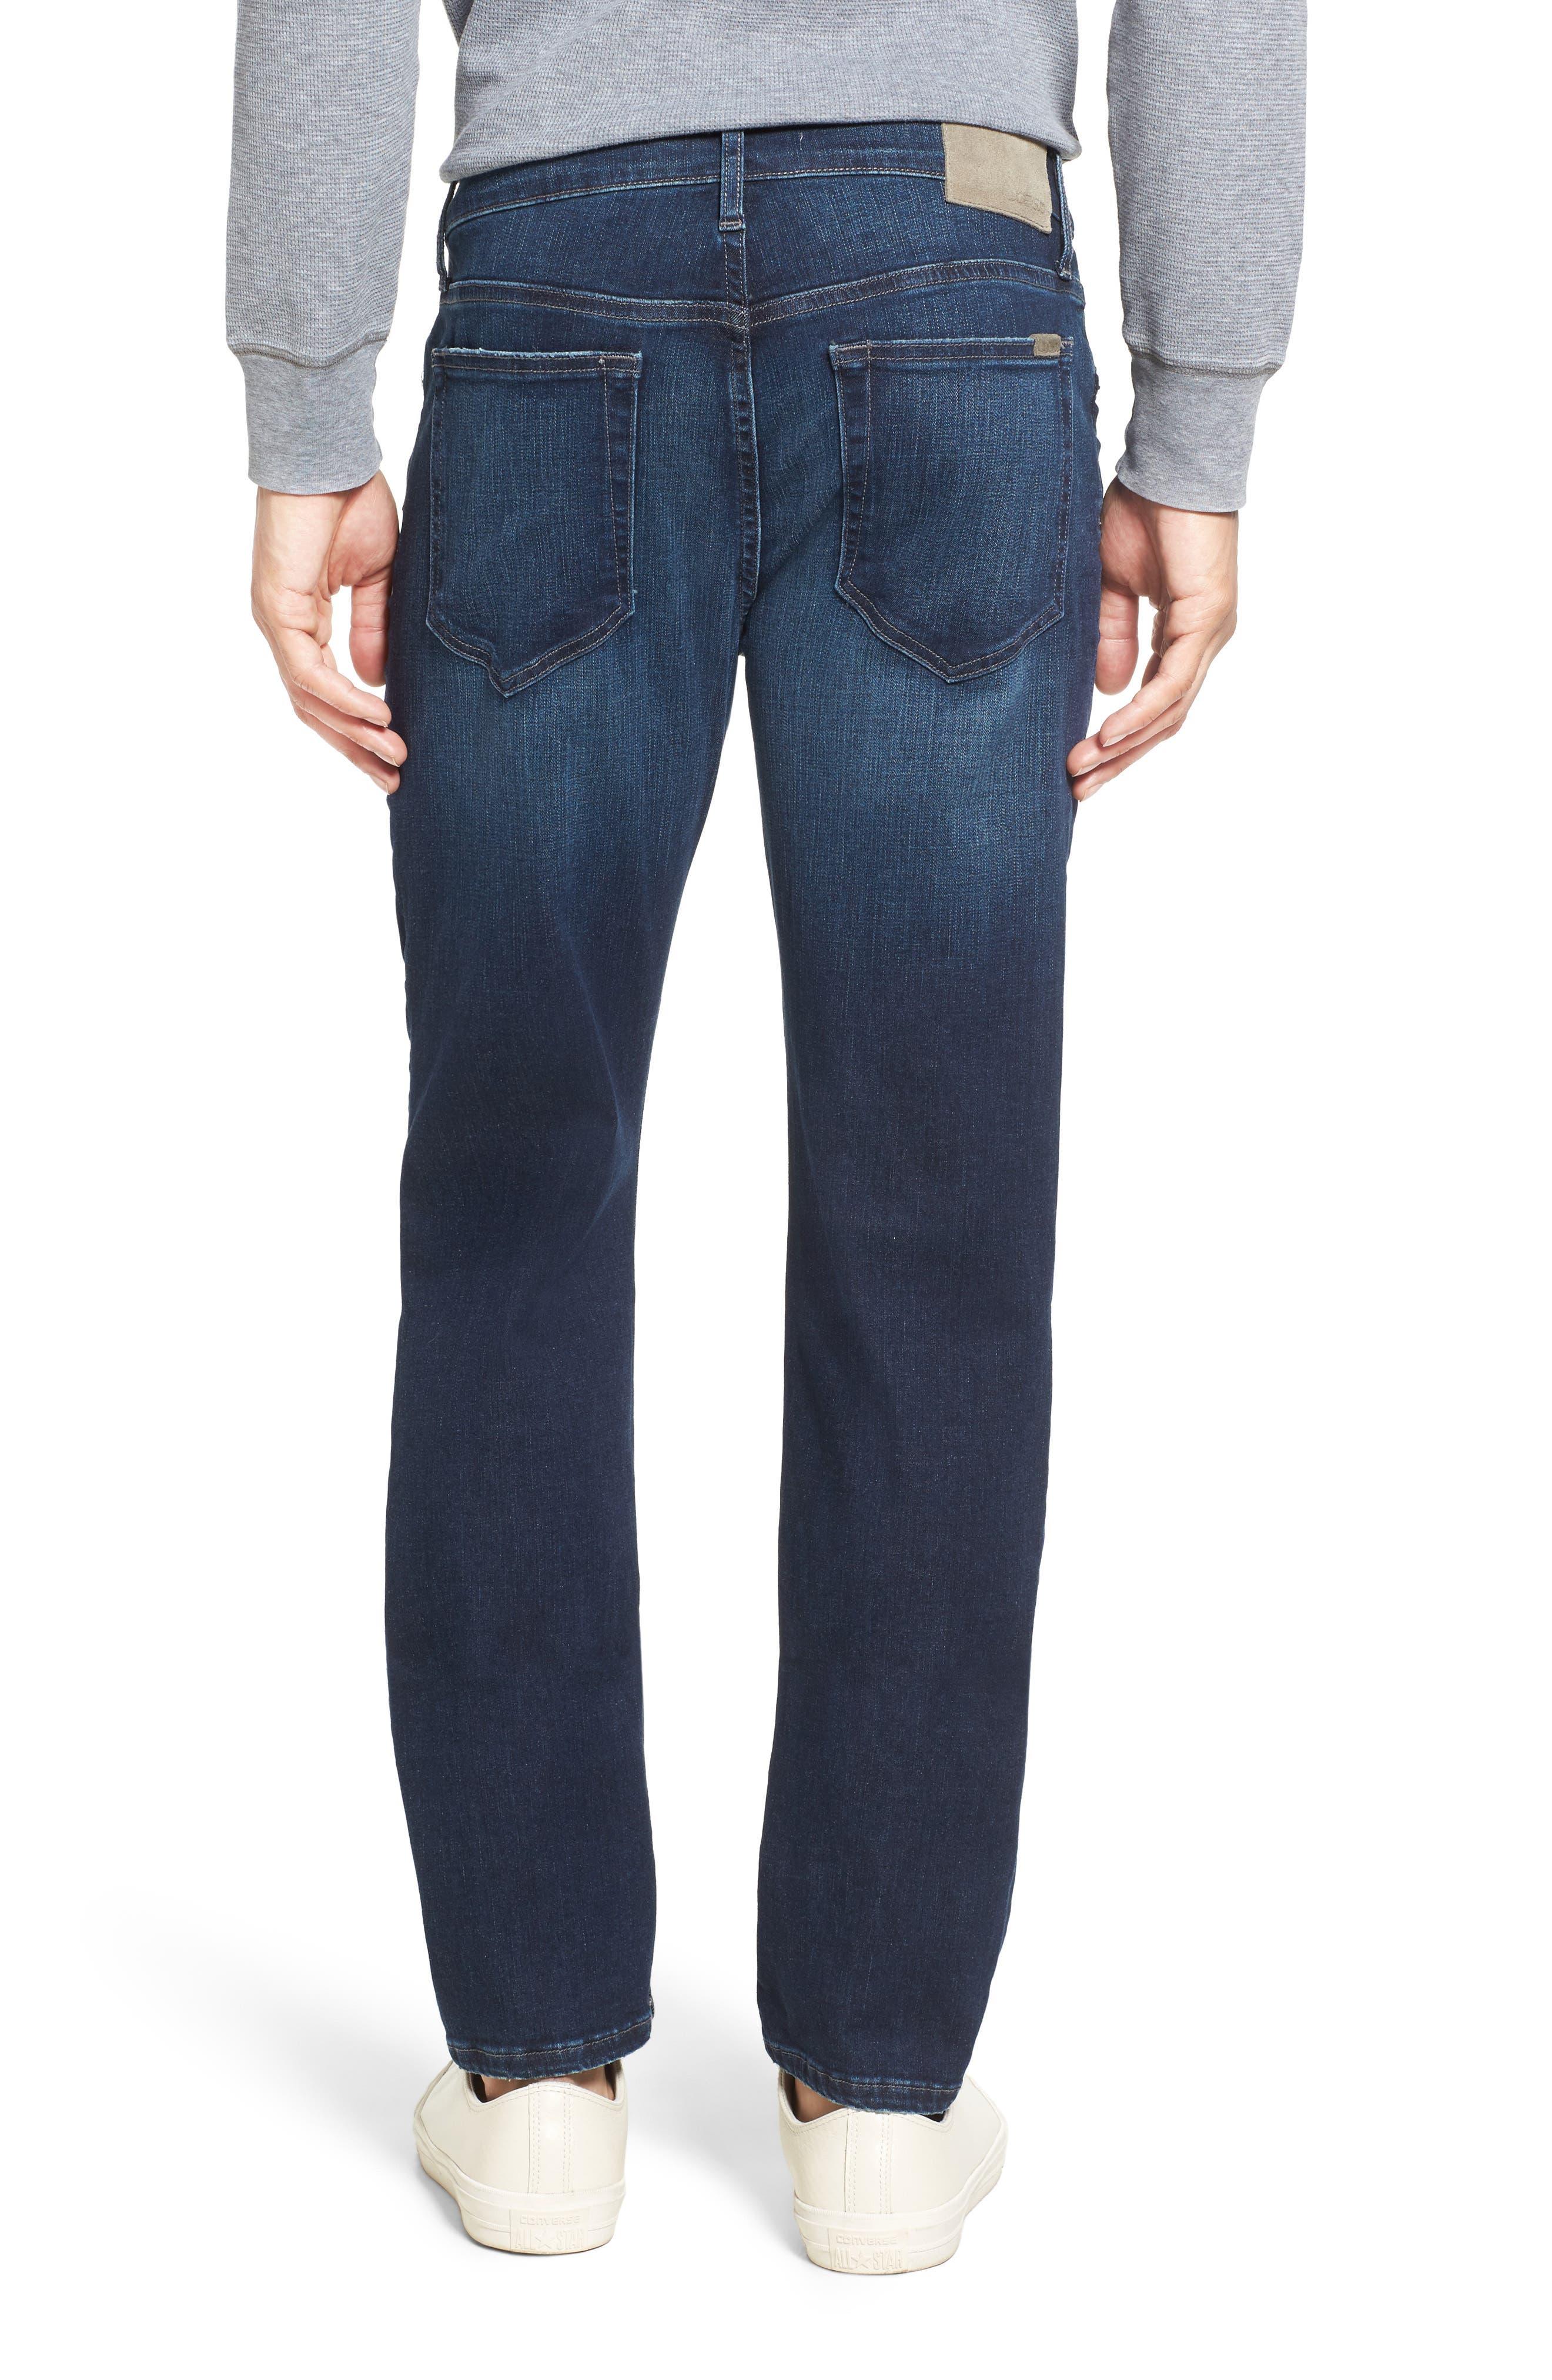 Kinetic Slim Fit Jeans,                             Alternate thumbnail 2, color,